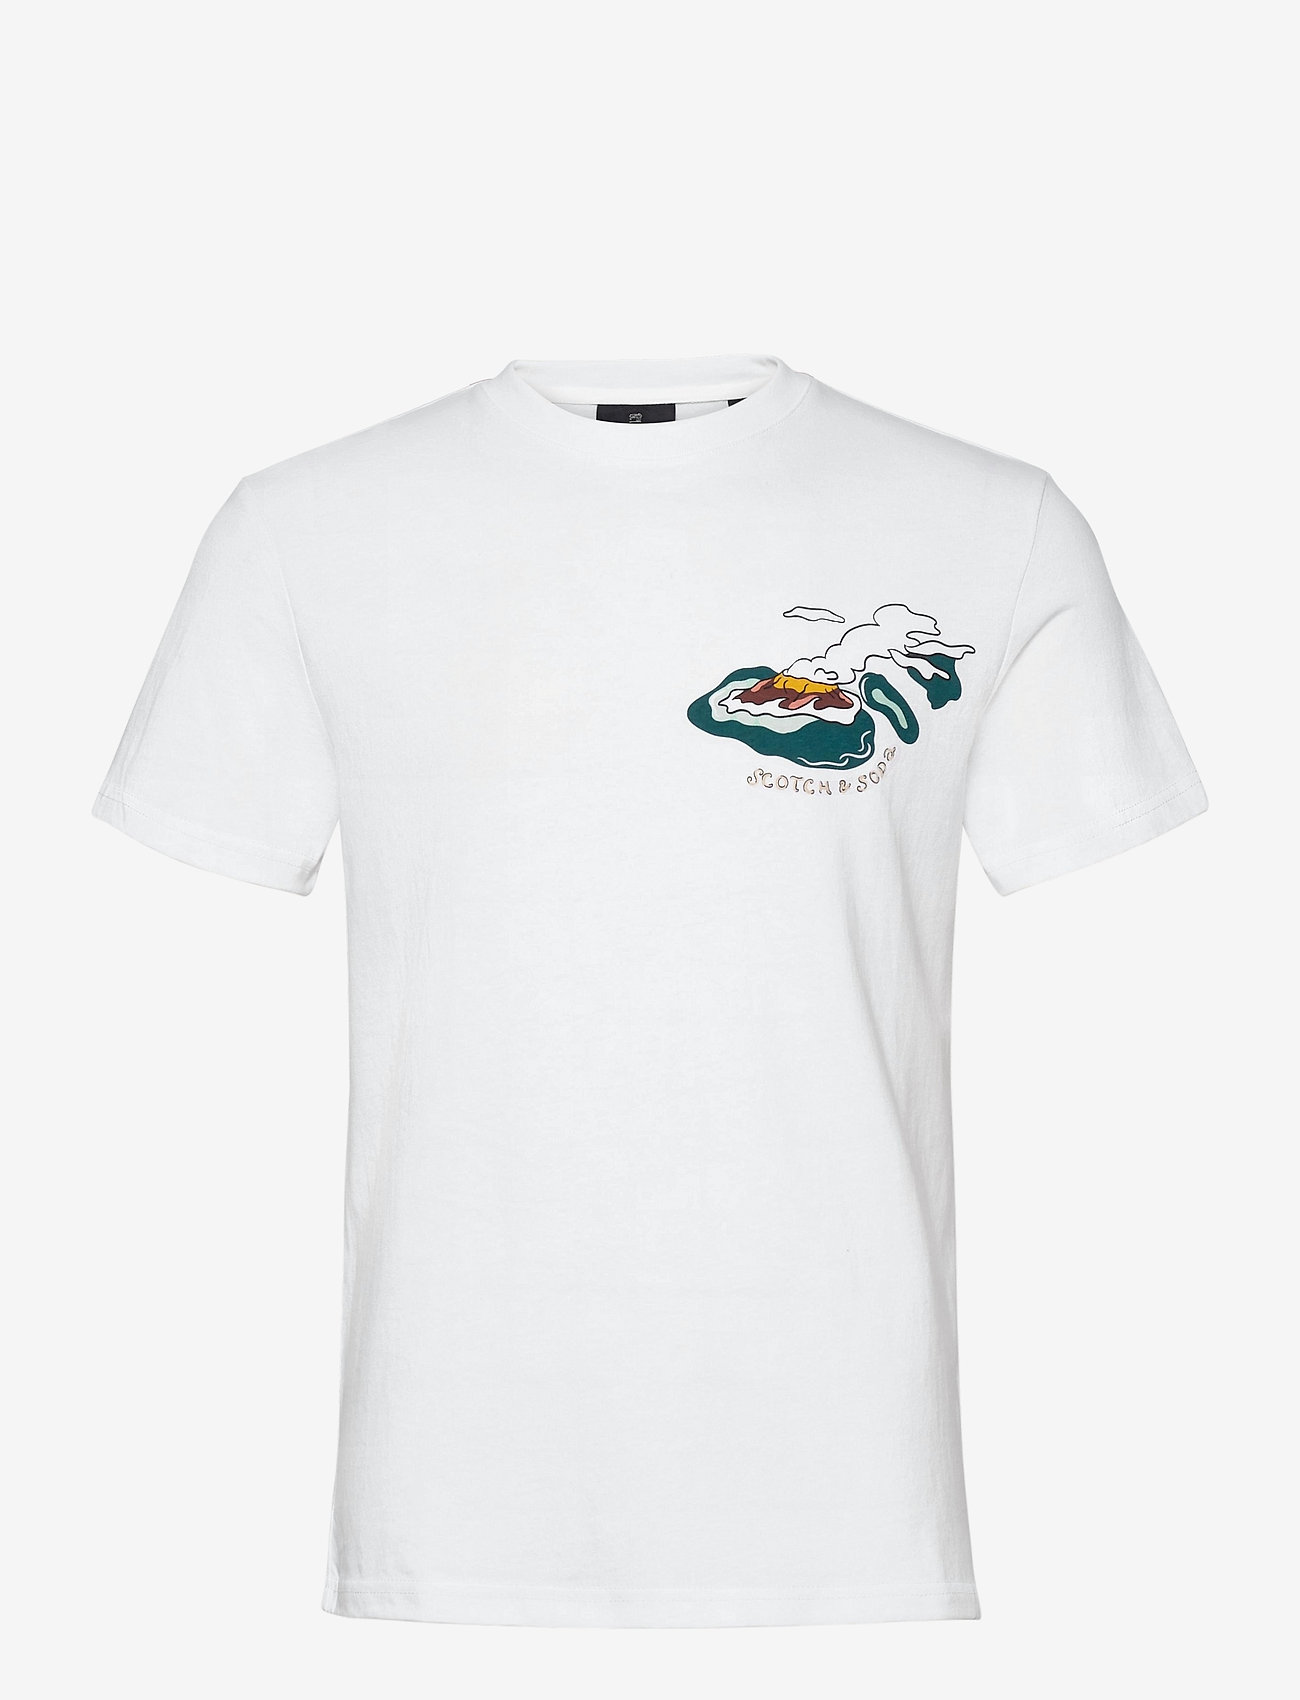 Scotch & Soda - Island souvenir tee - short-sleeved t-shirts - combo a - 0